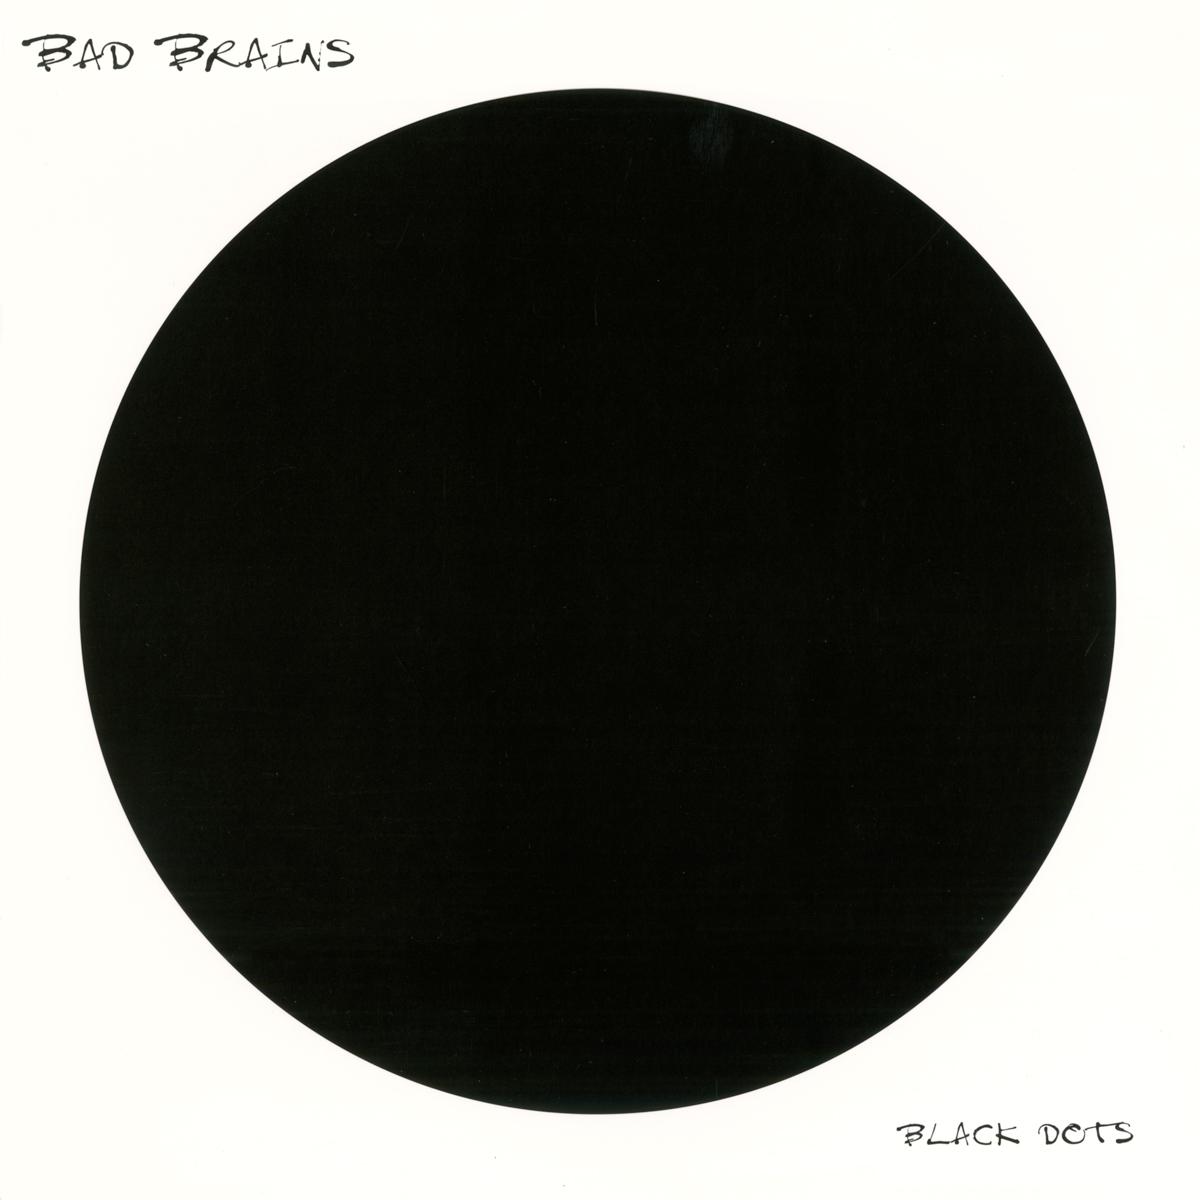 Black Dots – Bad Brains